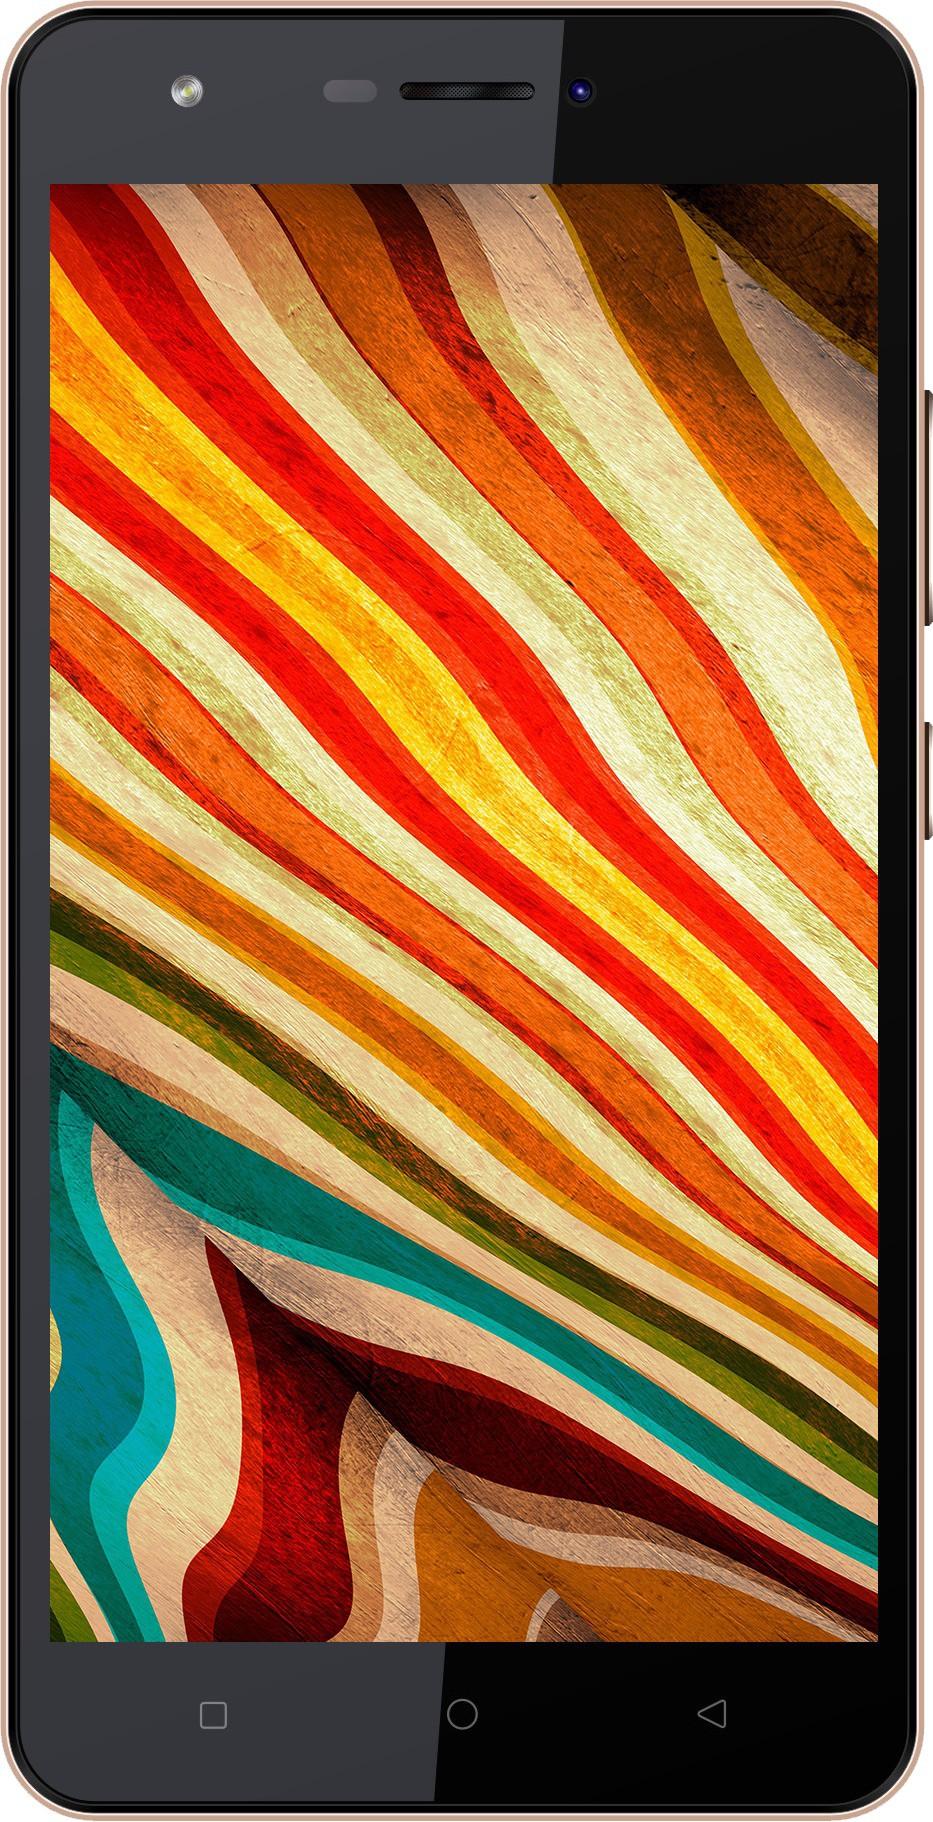 Karbonn Aura Note 4G (Champagne, 16 GB)(2 GB RAM) image